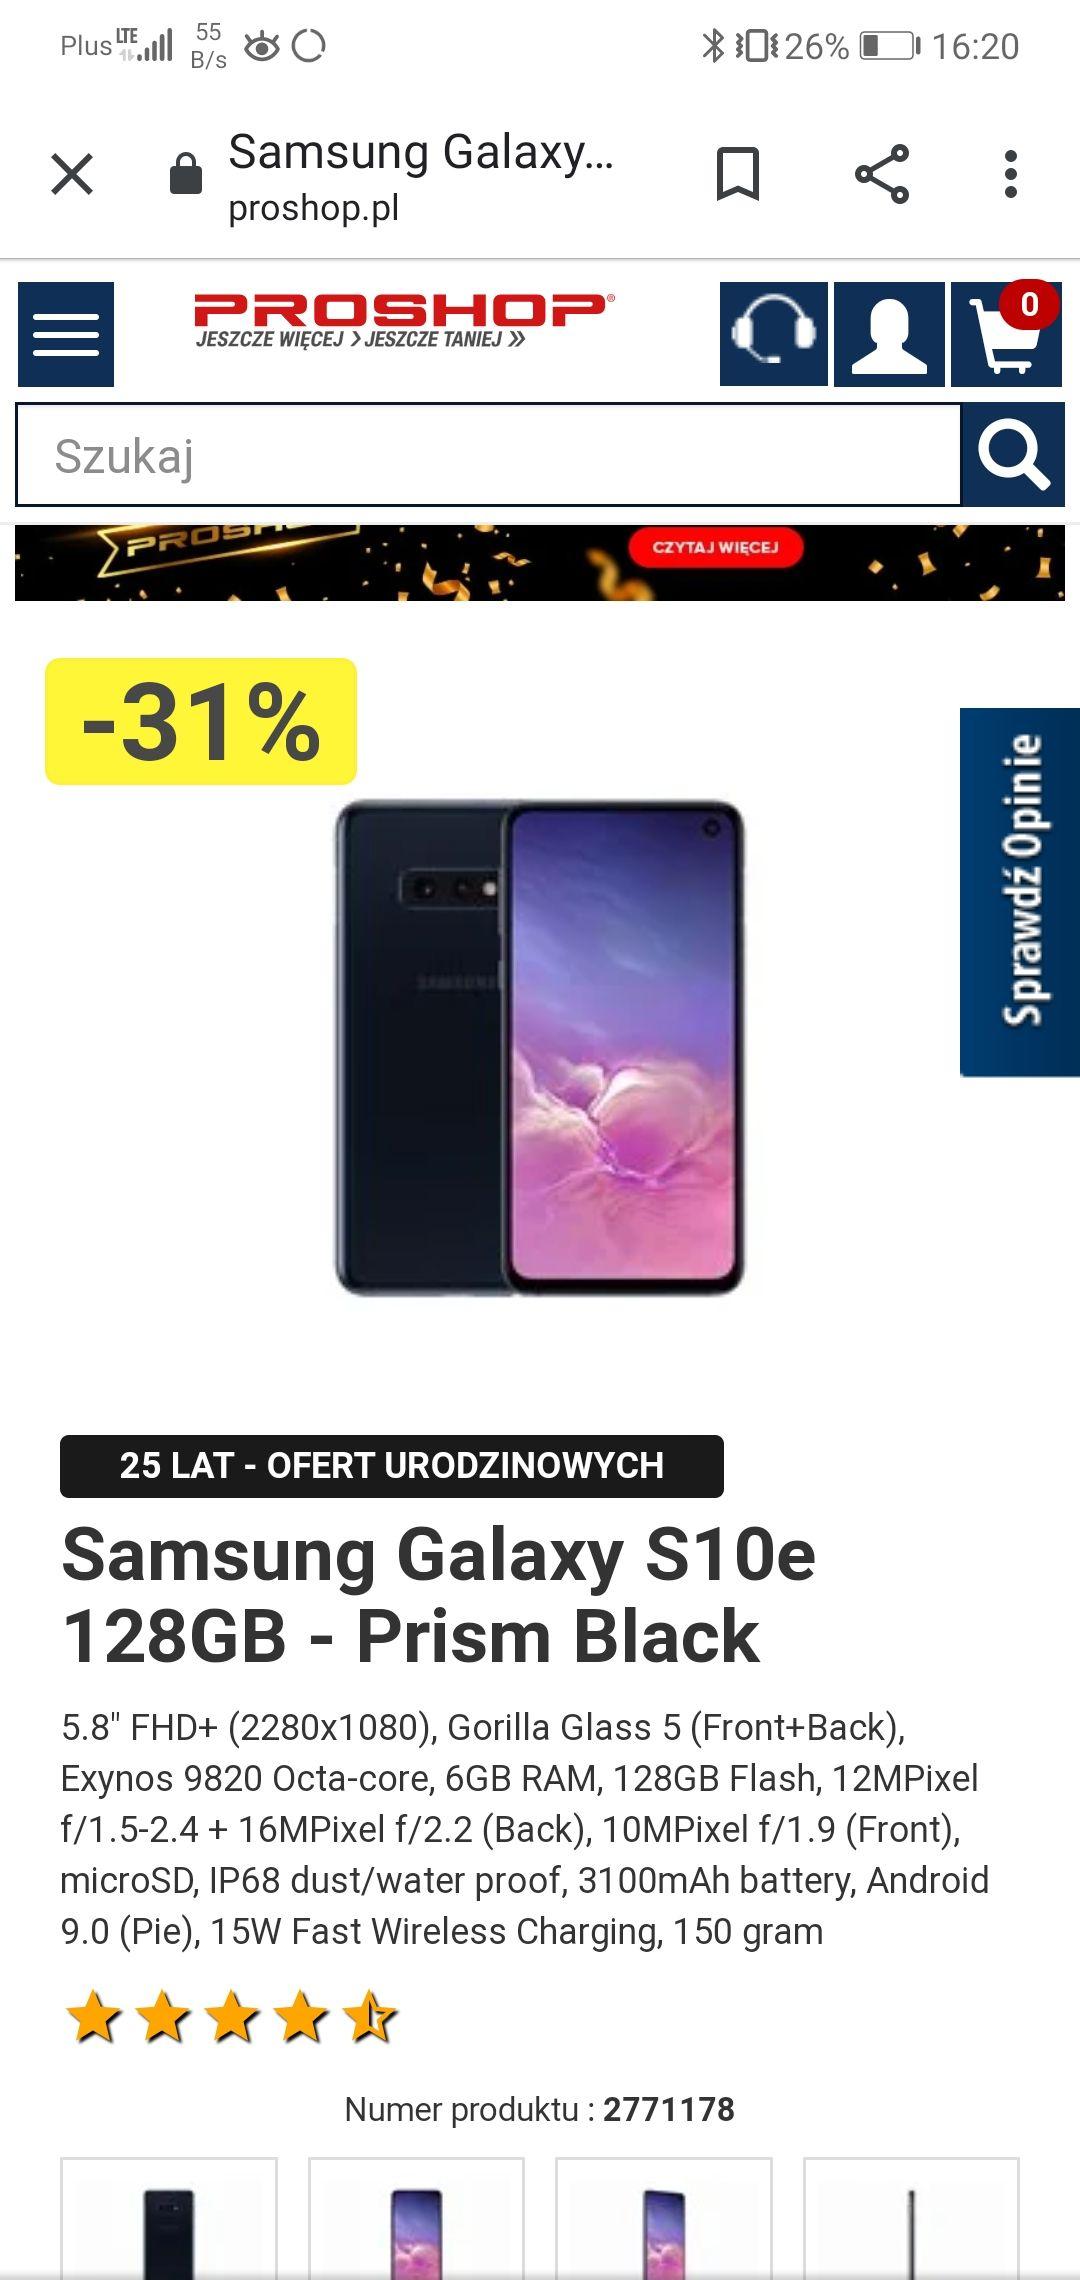 Samsung Galaxy S10e 128GB - Prism Black